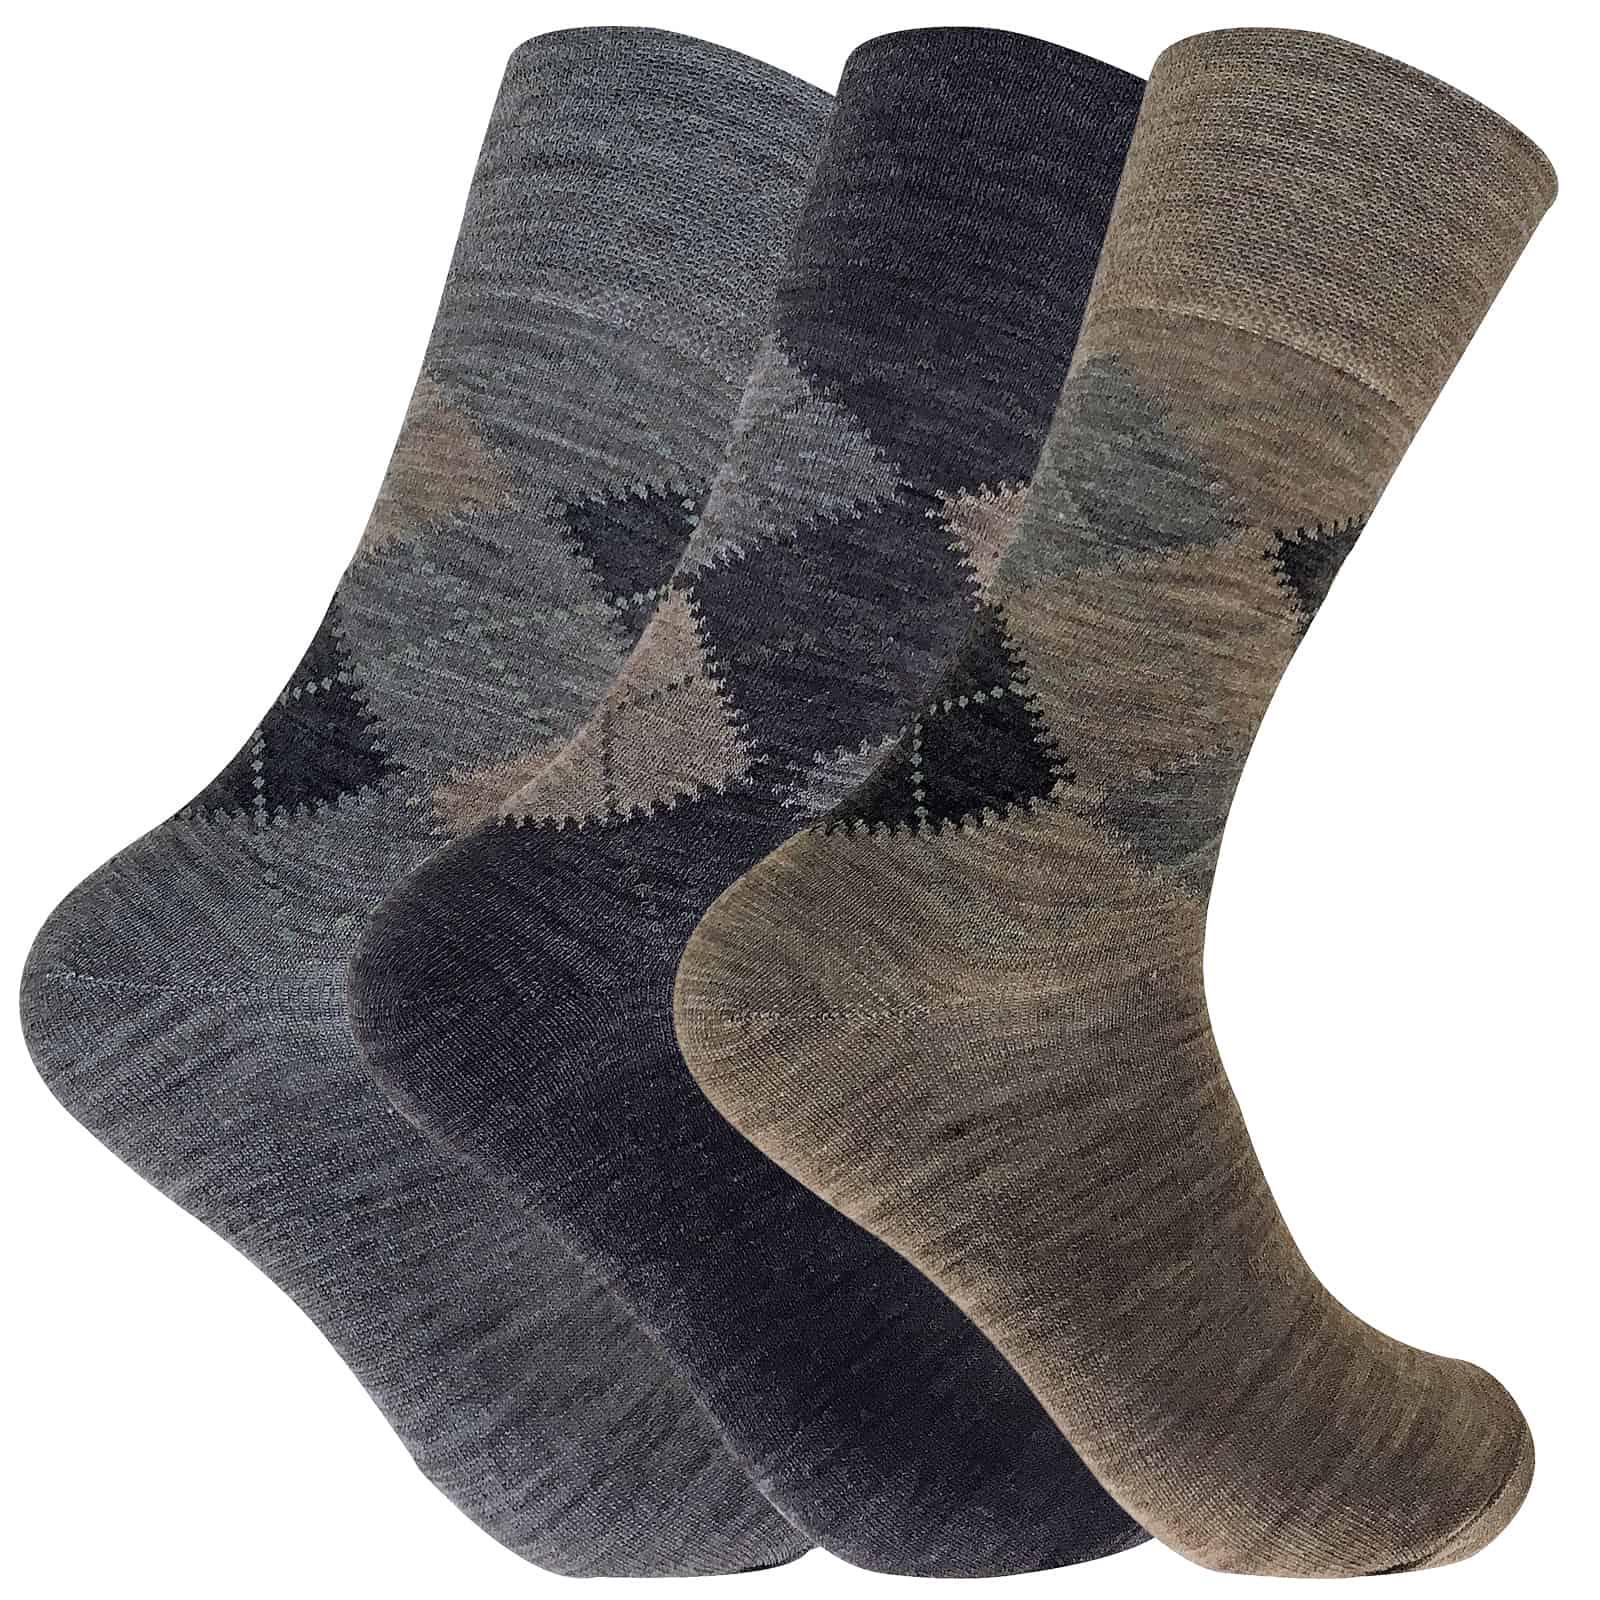 3 Pack Mens Warm Loose Non Elastic Lambs Wool Argyle Pattern Socks for Poor Circulation - 6-11 UK, SE049 Brown